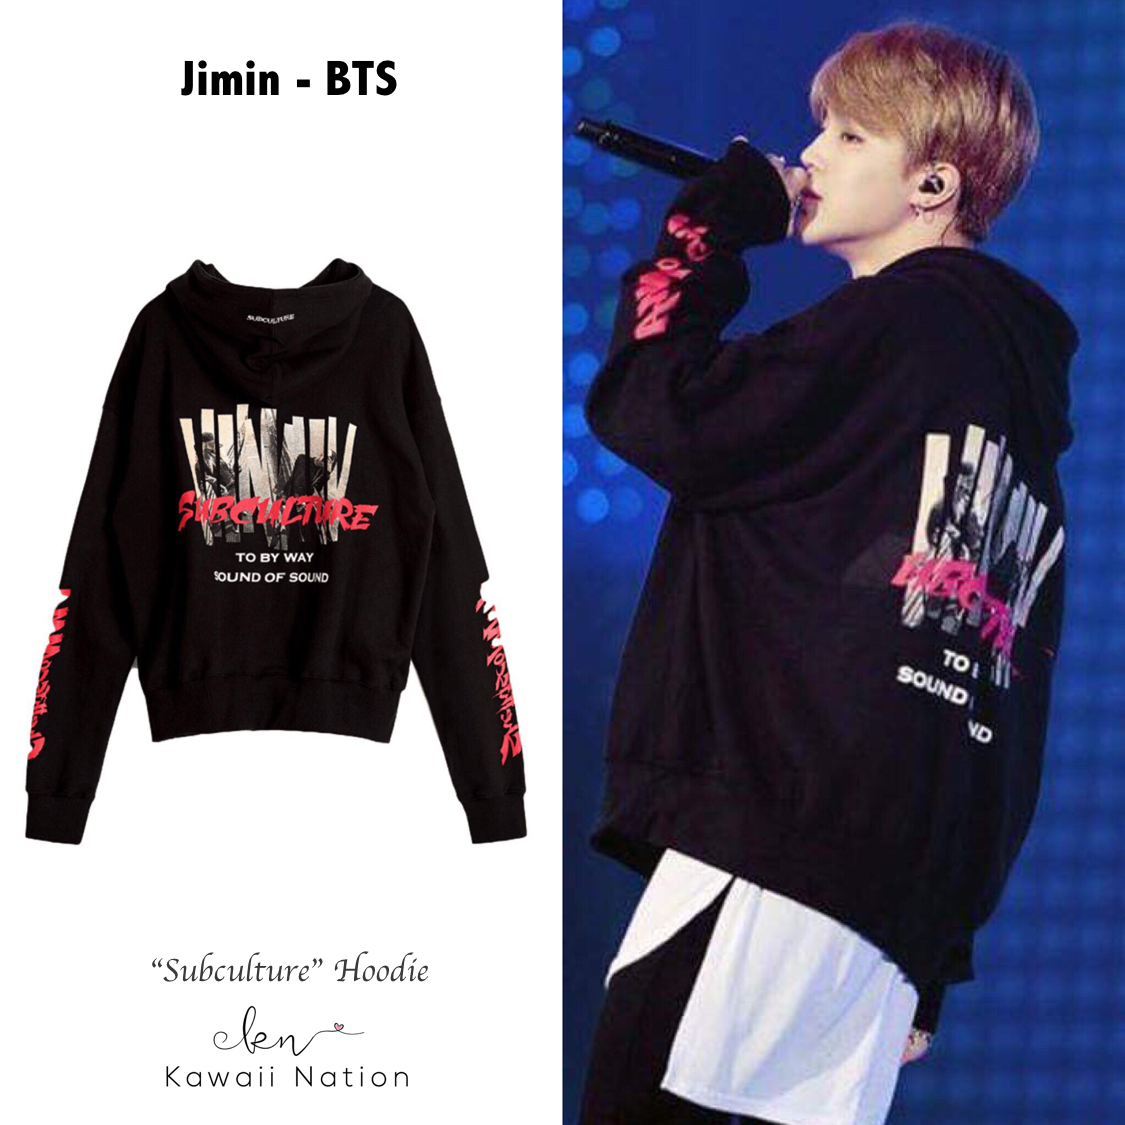 7b055767f BTS Fashion Inspired Outfits V Tae-hyung Jungkook RM Rap Monsta Jin Jimin  JHope Suga Kawaii Nation celebs kpop tshirt hoodie idol bt21 cute fashion  harajuku